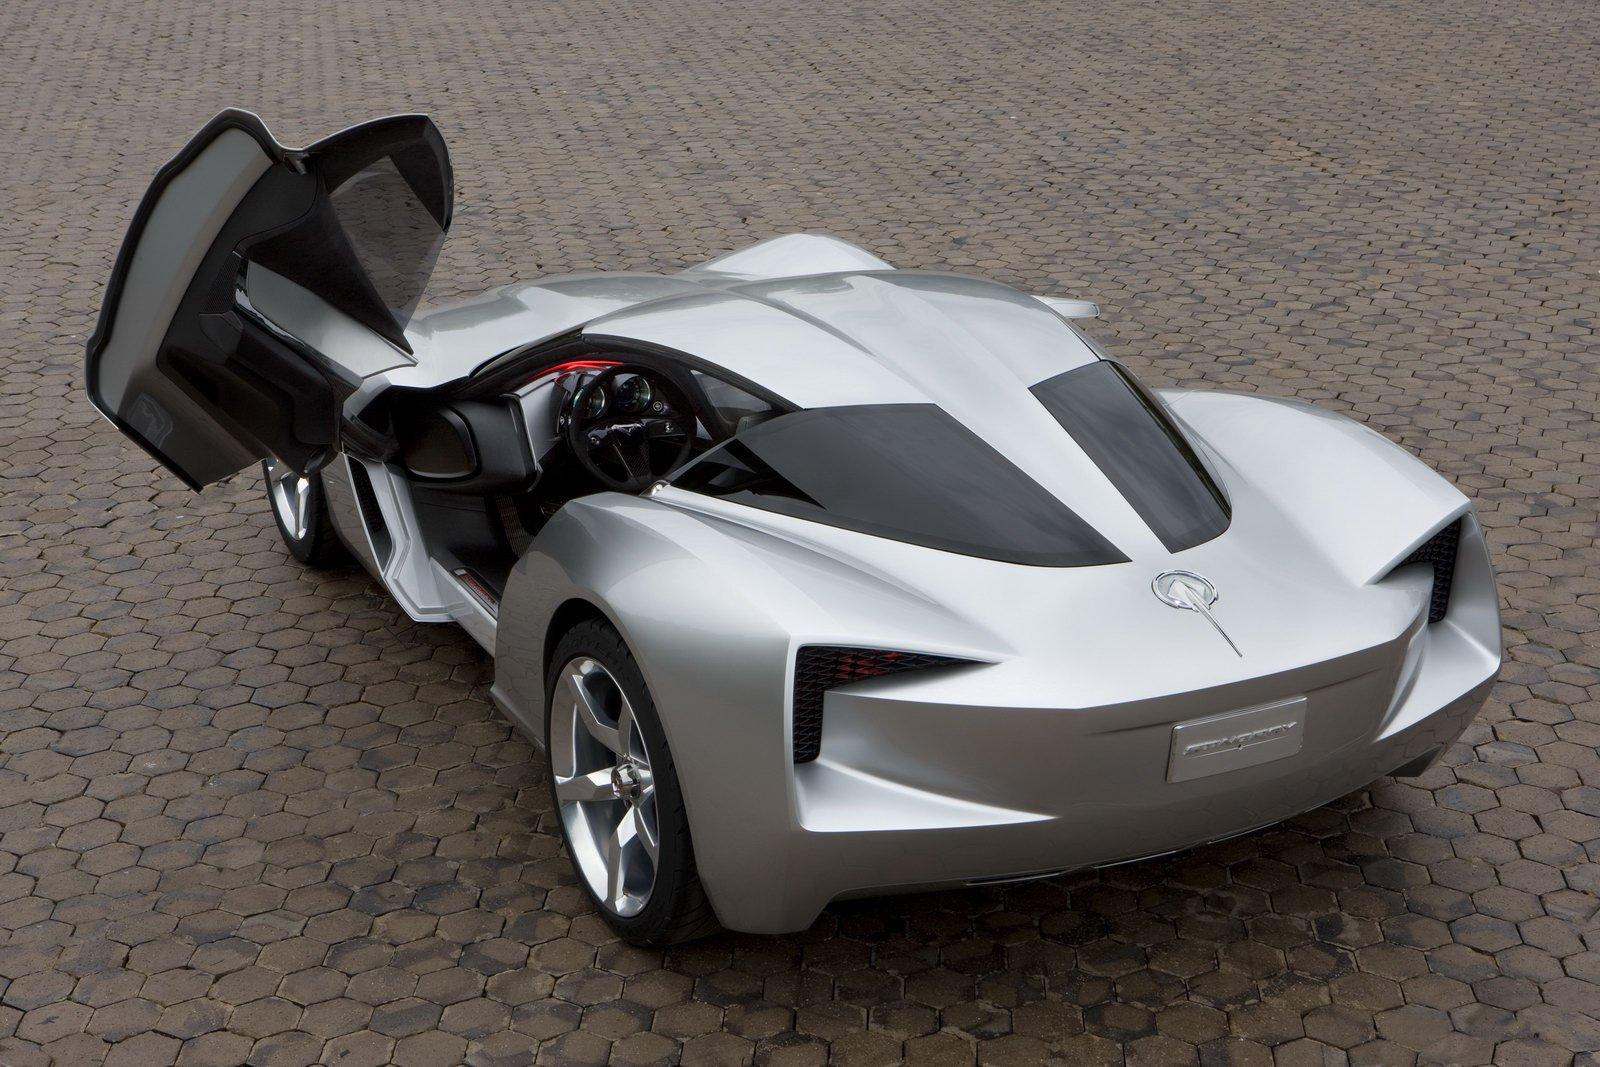 2009 chevrolet corvette stingray c7 7th generation concept